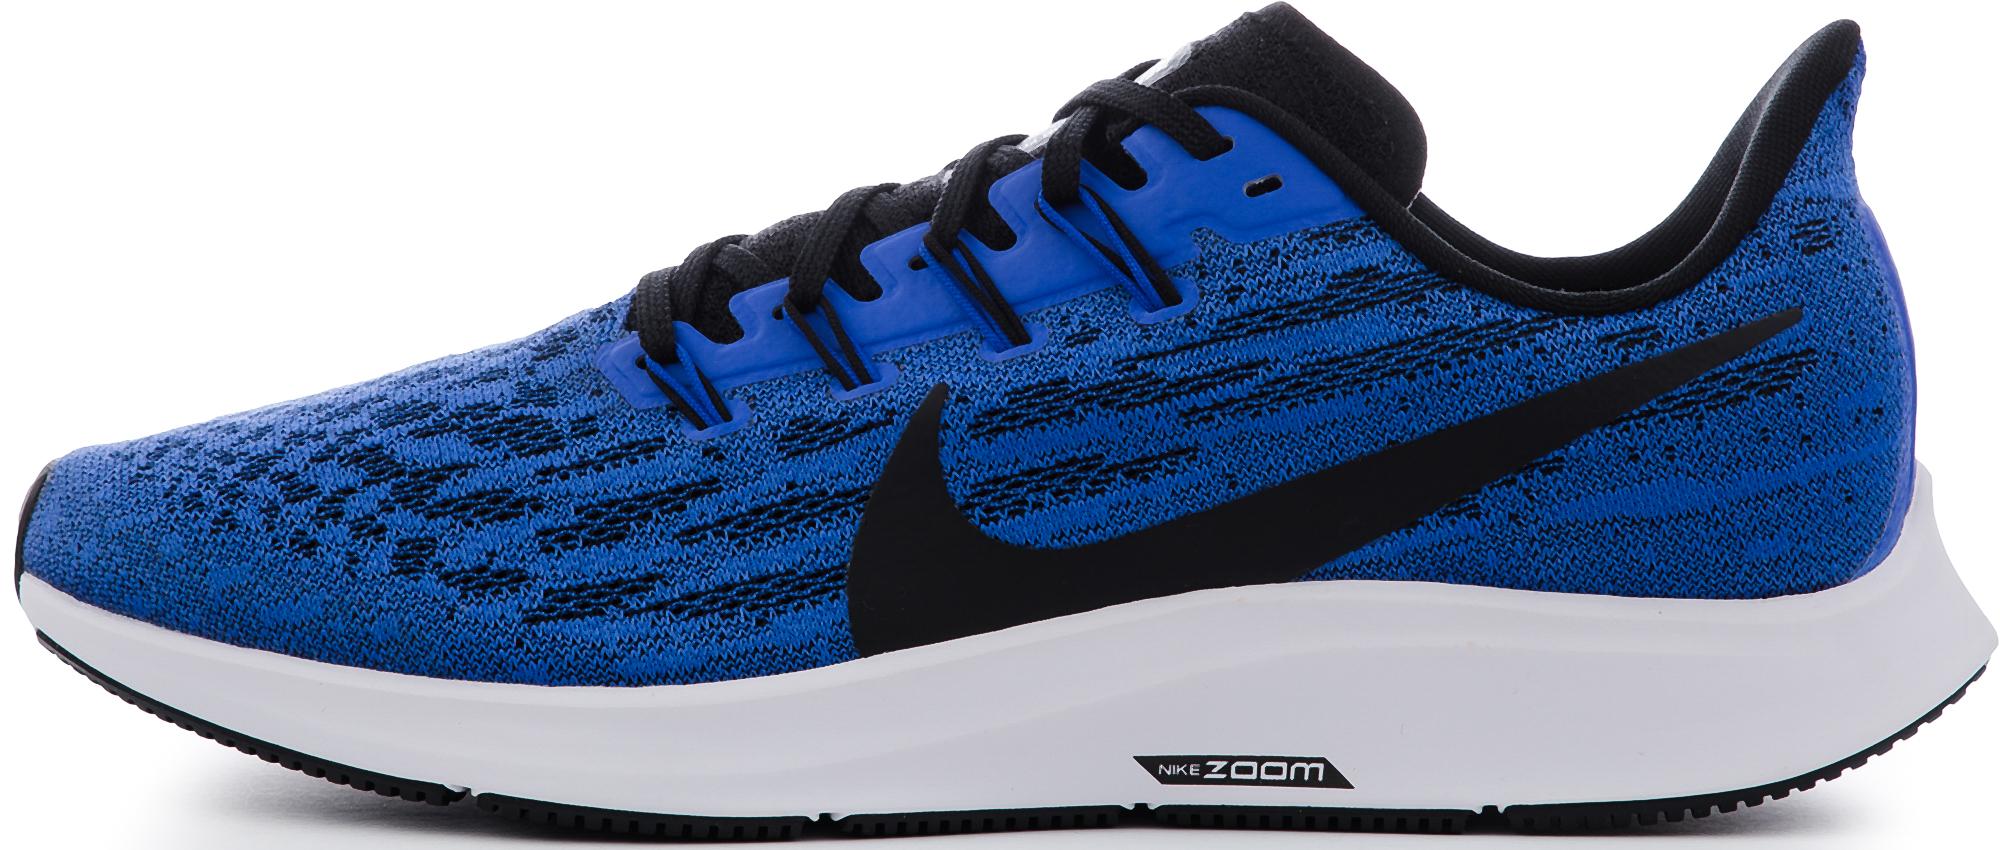 Nike Кроссовки мужские Air Zoom Pegasus 36, размер 41,5